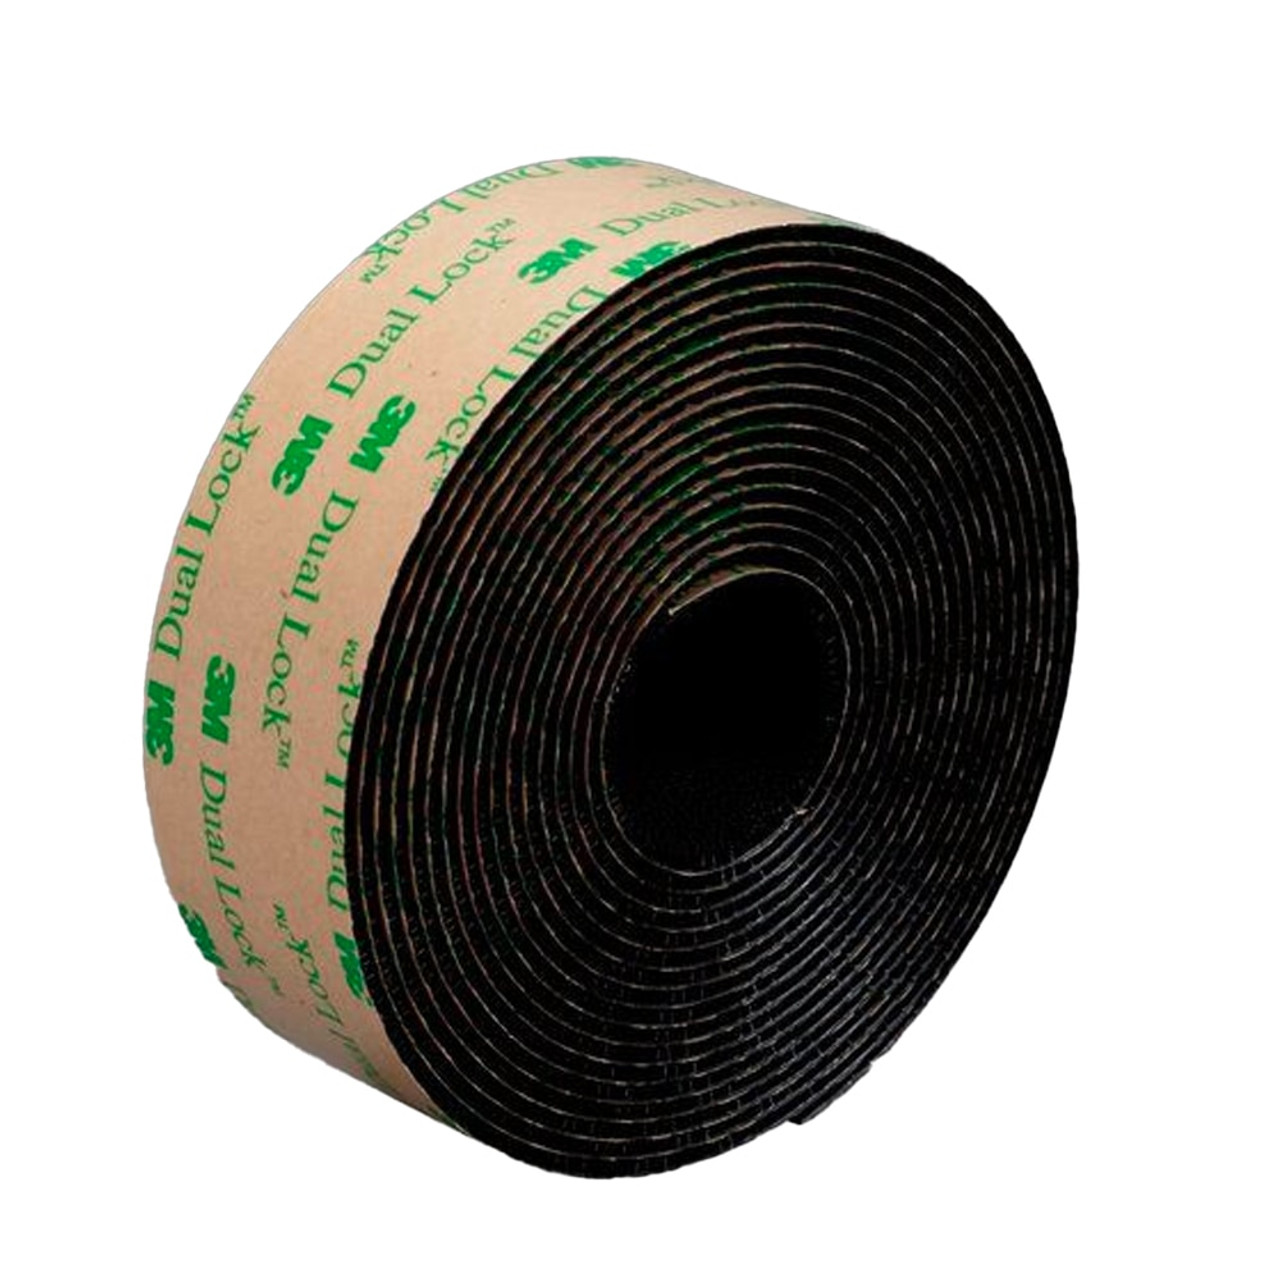 3M™ Dual Lock™ Low Profile Tape Roll - Black